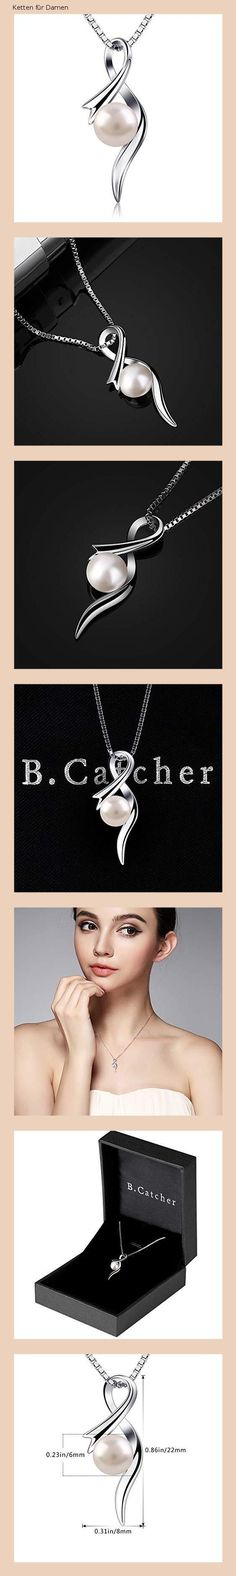 Ketten für Damen · B.Catcher Perle Halskette Kette Anhänger 925 Sterling  Silber Schmuck Süßwasser Zuchtperle Schmuck 45CM Kettenlänge e1a15abf12